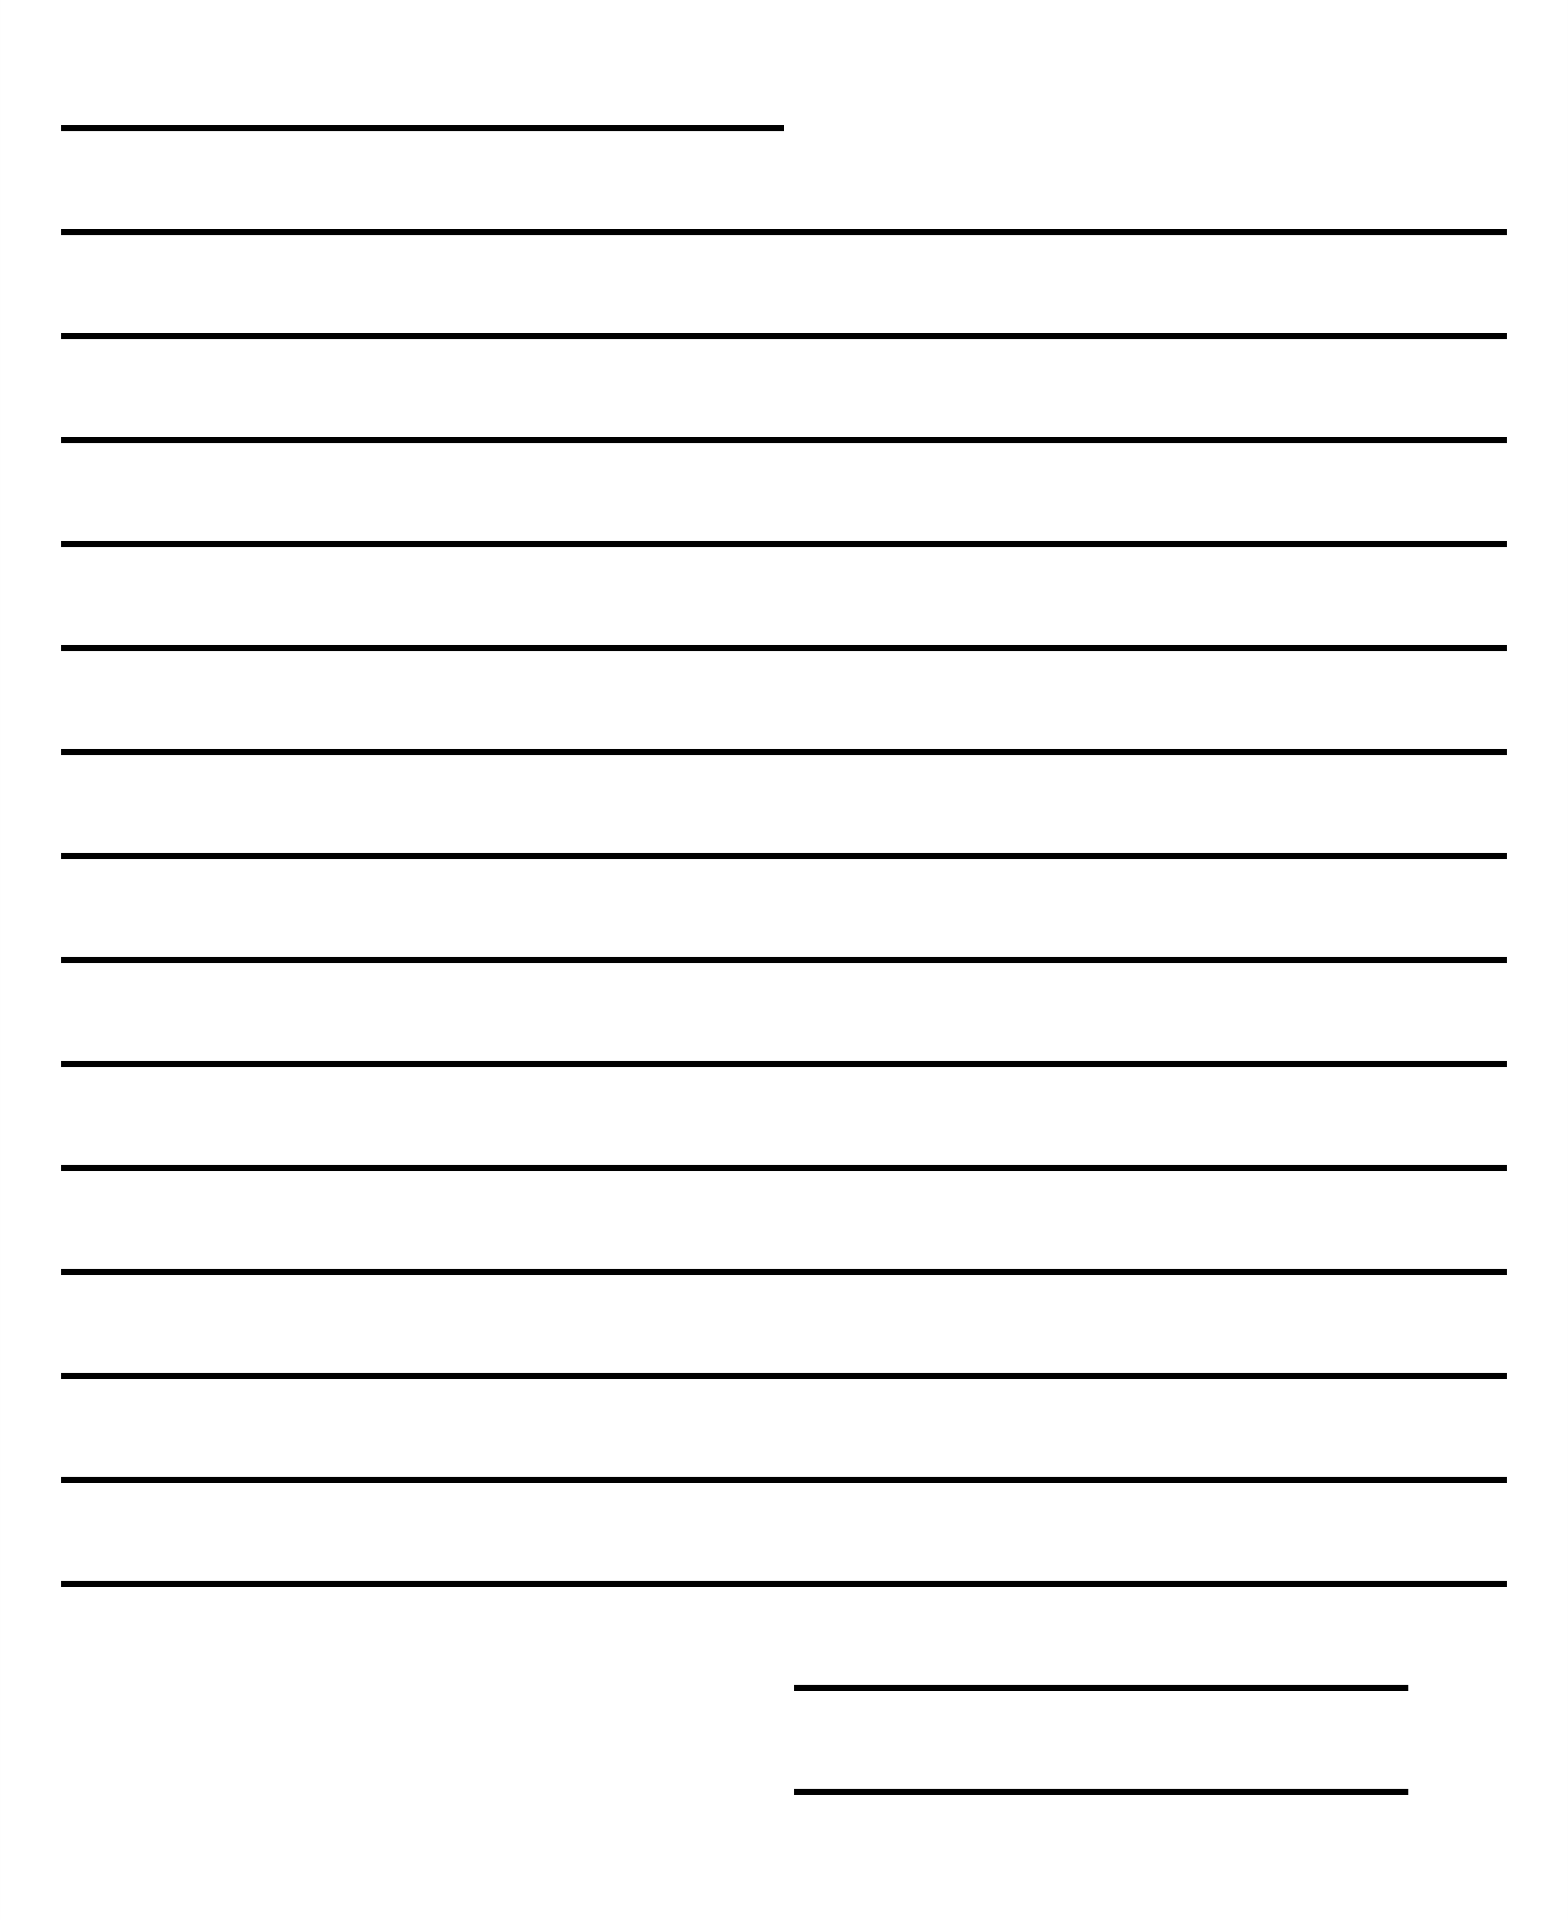 Blank Letter Template - Letter-Writing Template, Blank Letter ...